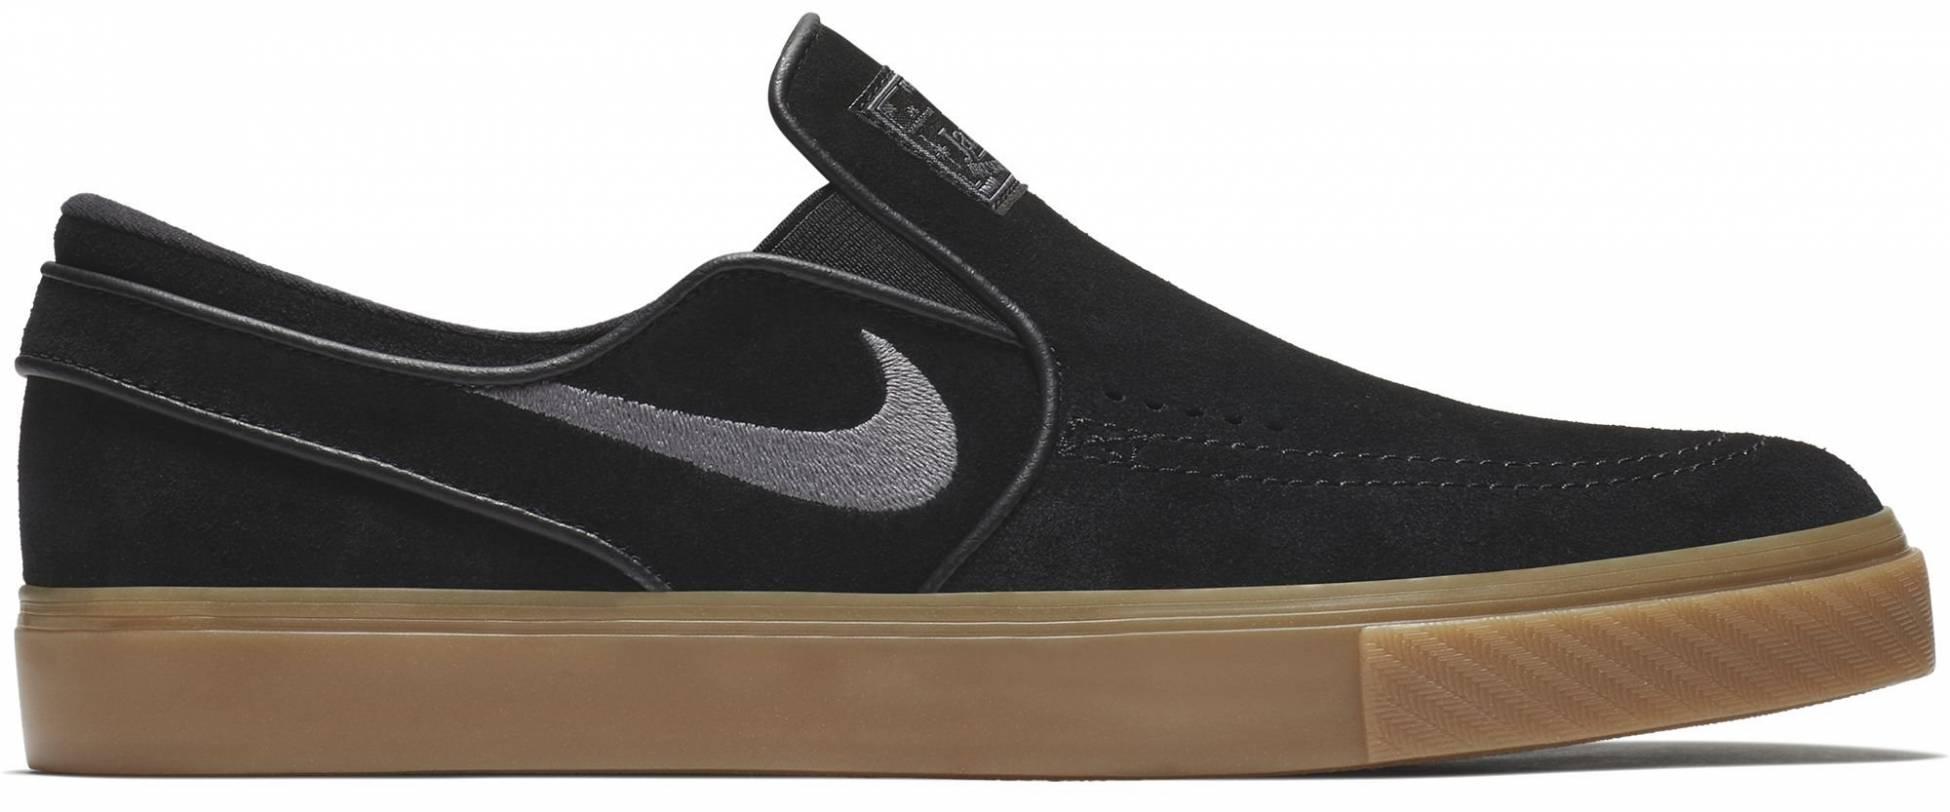 El sendero Grafico Charlotte Bronte  Nike SB Zoom Stefan Janoski Slip-On sneakers in black | RunRepeat